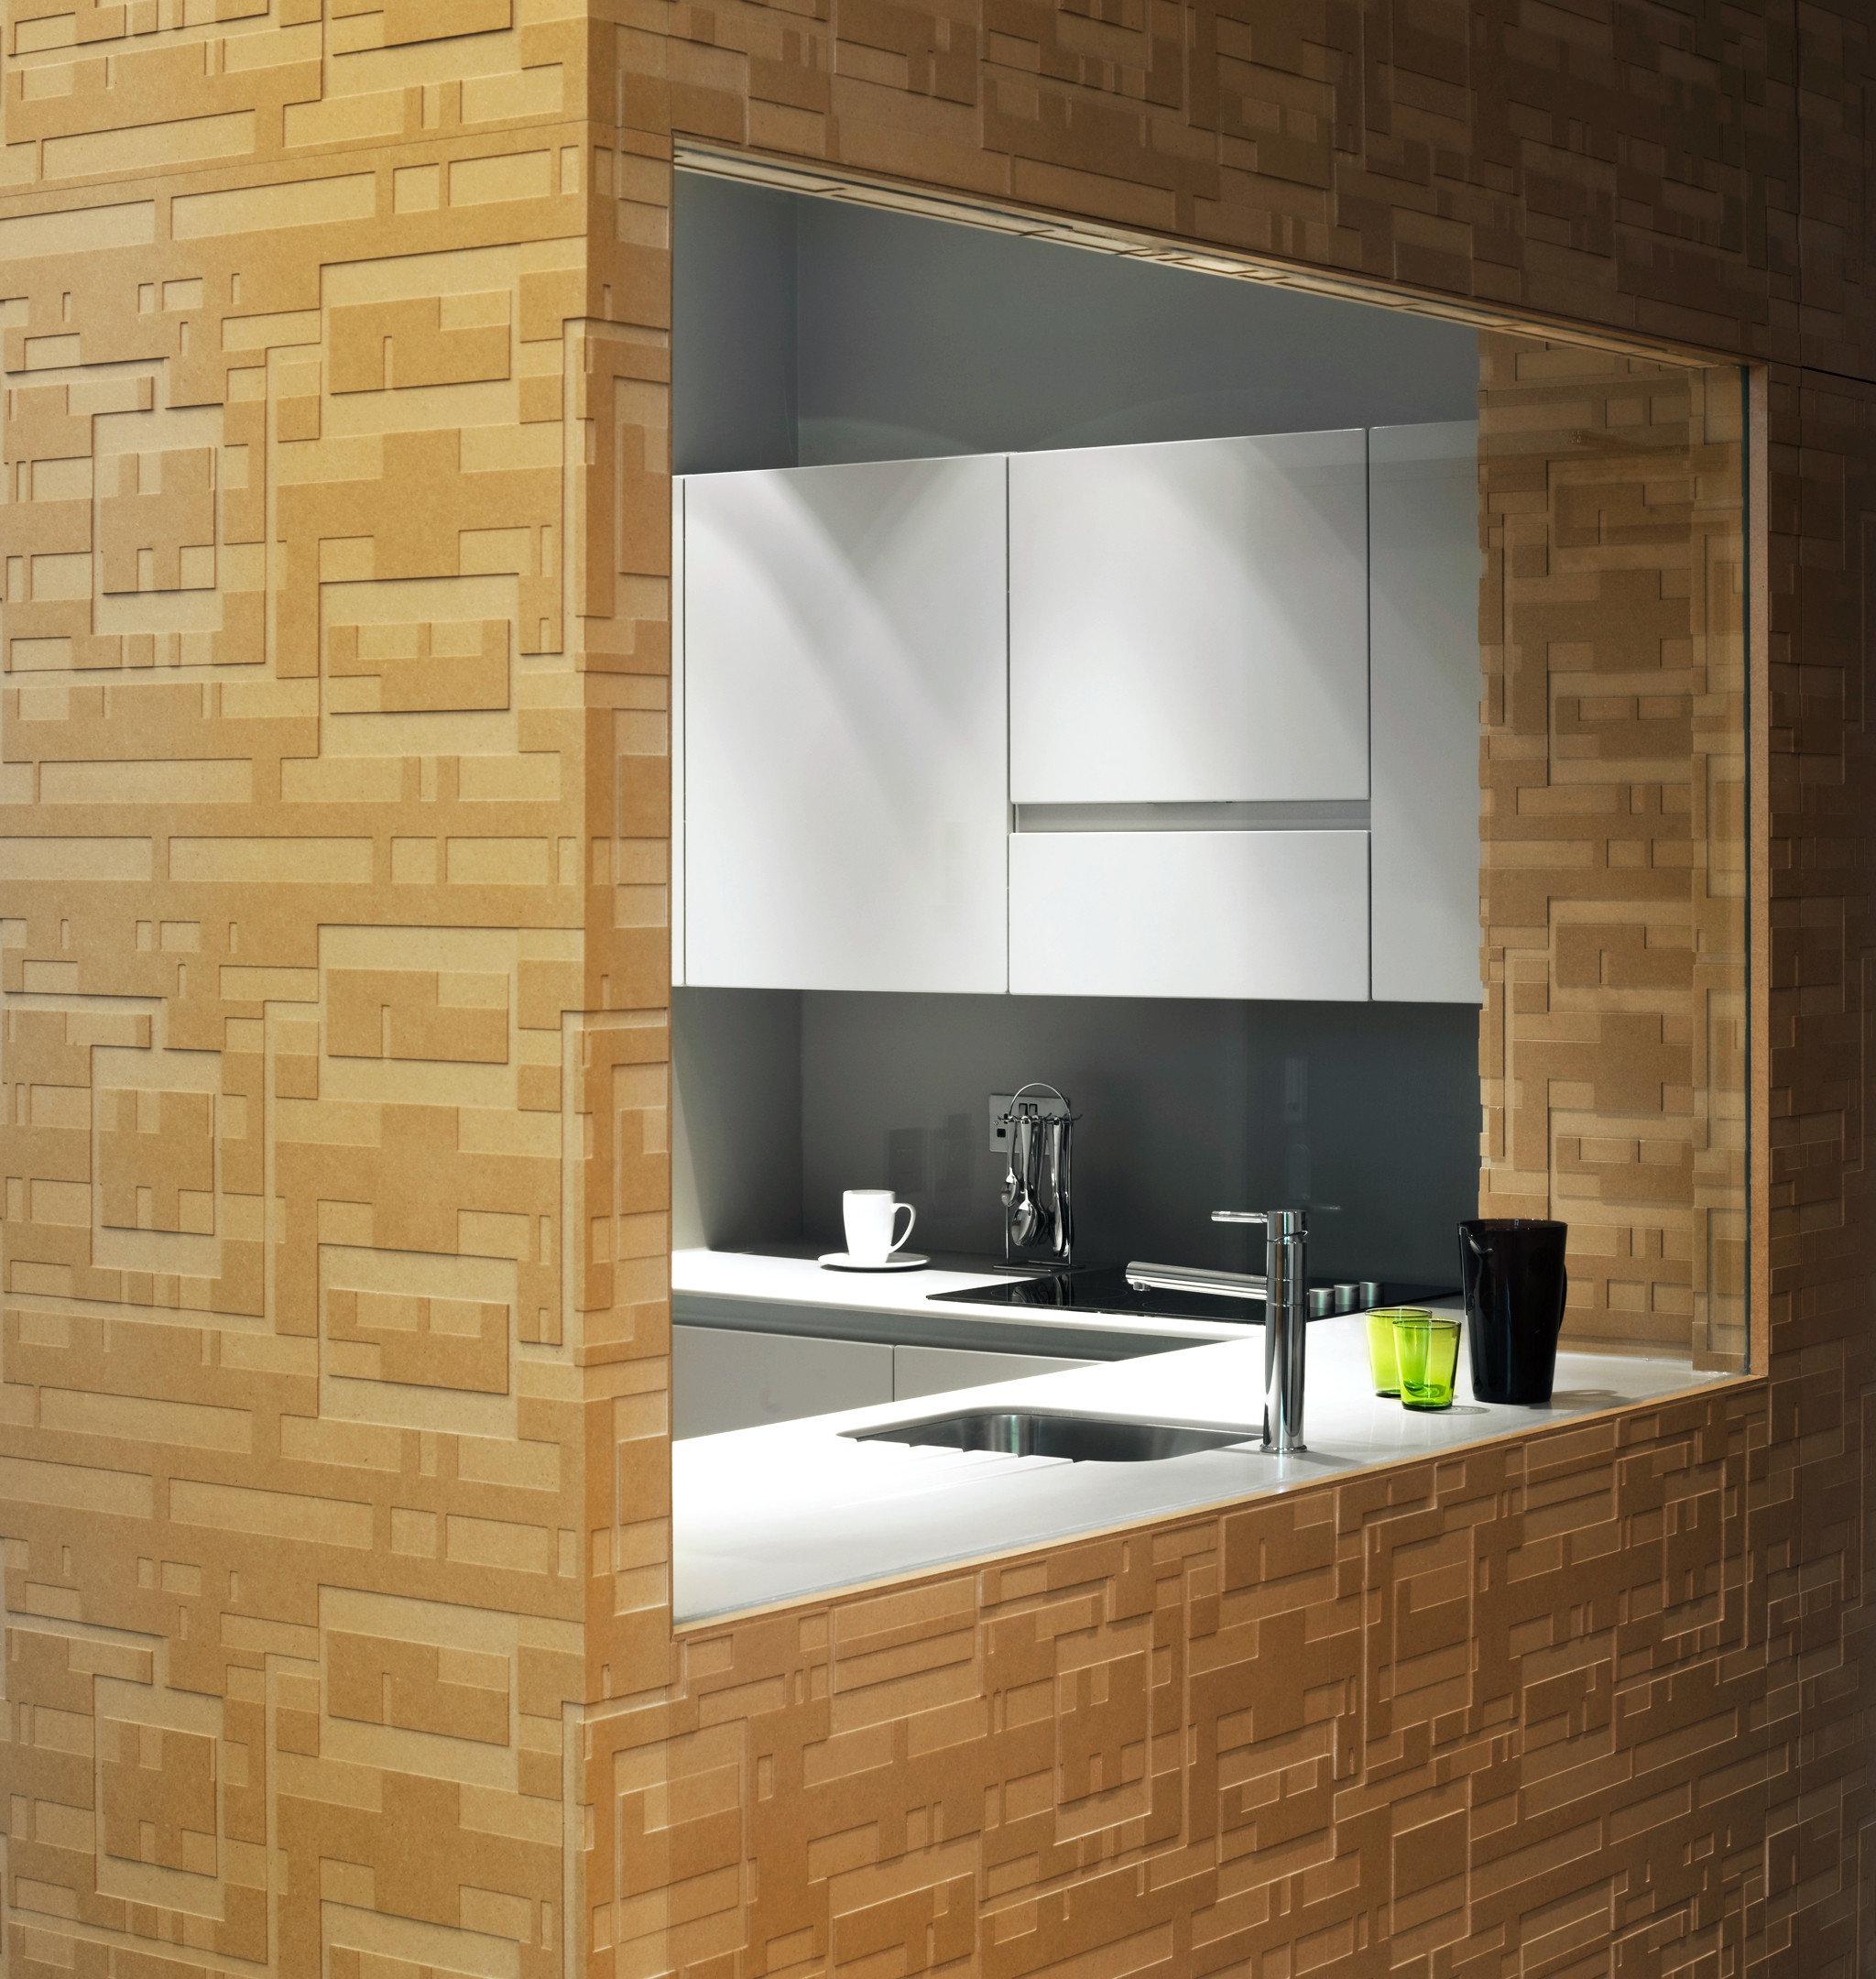 Kitchen Modern bathroom brick hearth Fireplace tile sink flooring cabinetry tiled